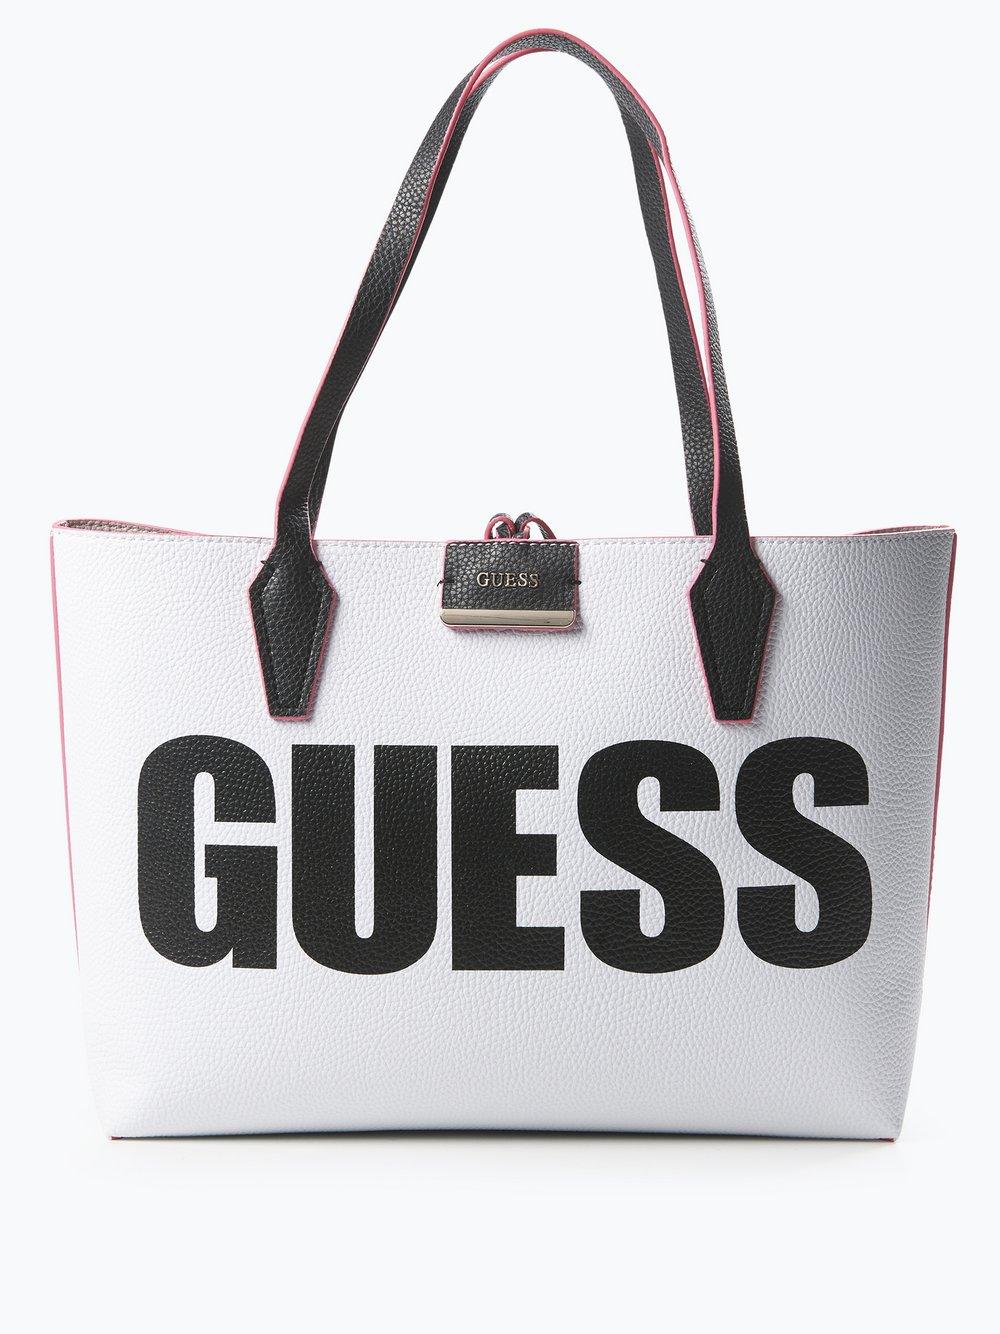 Mit Handtasche Jeans Guess Wende Damen Leder Shopper In vNn8Om0w